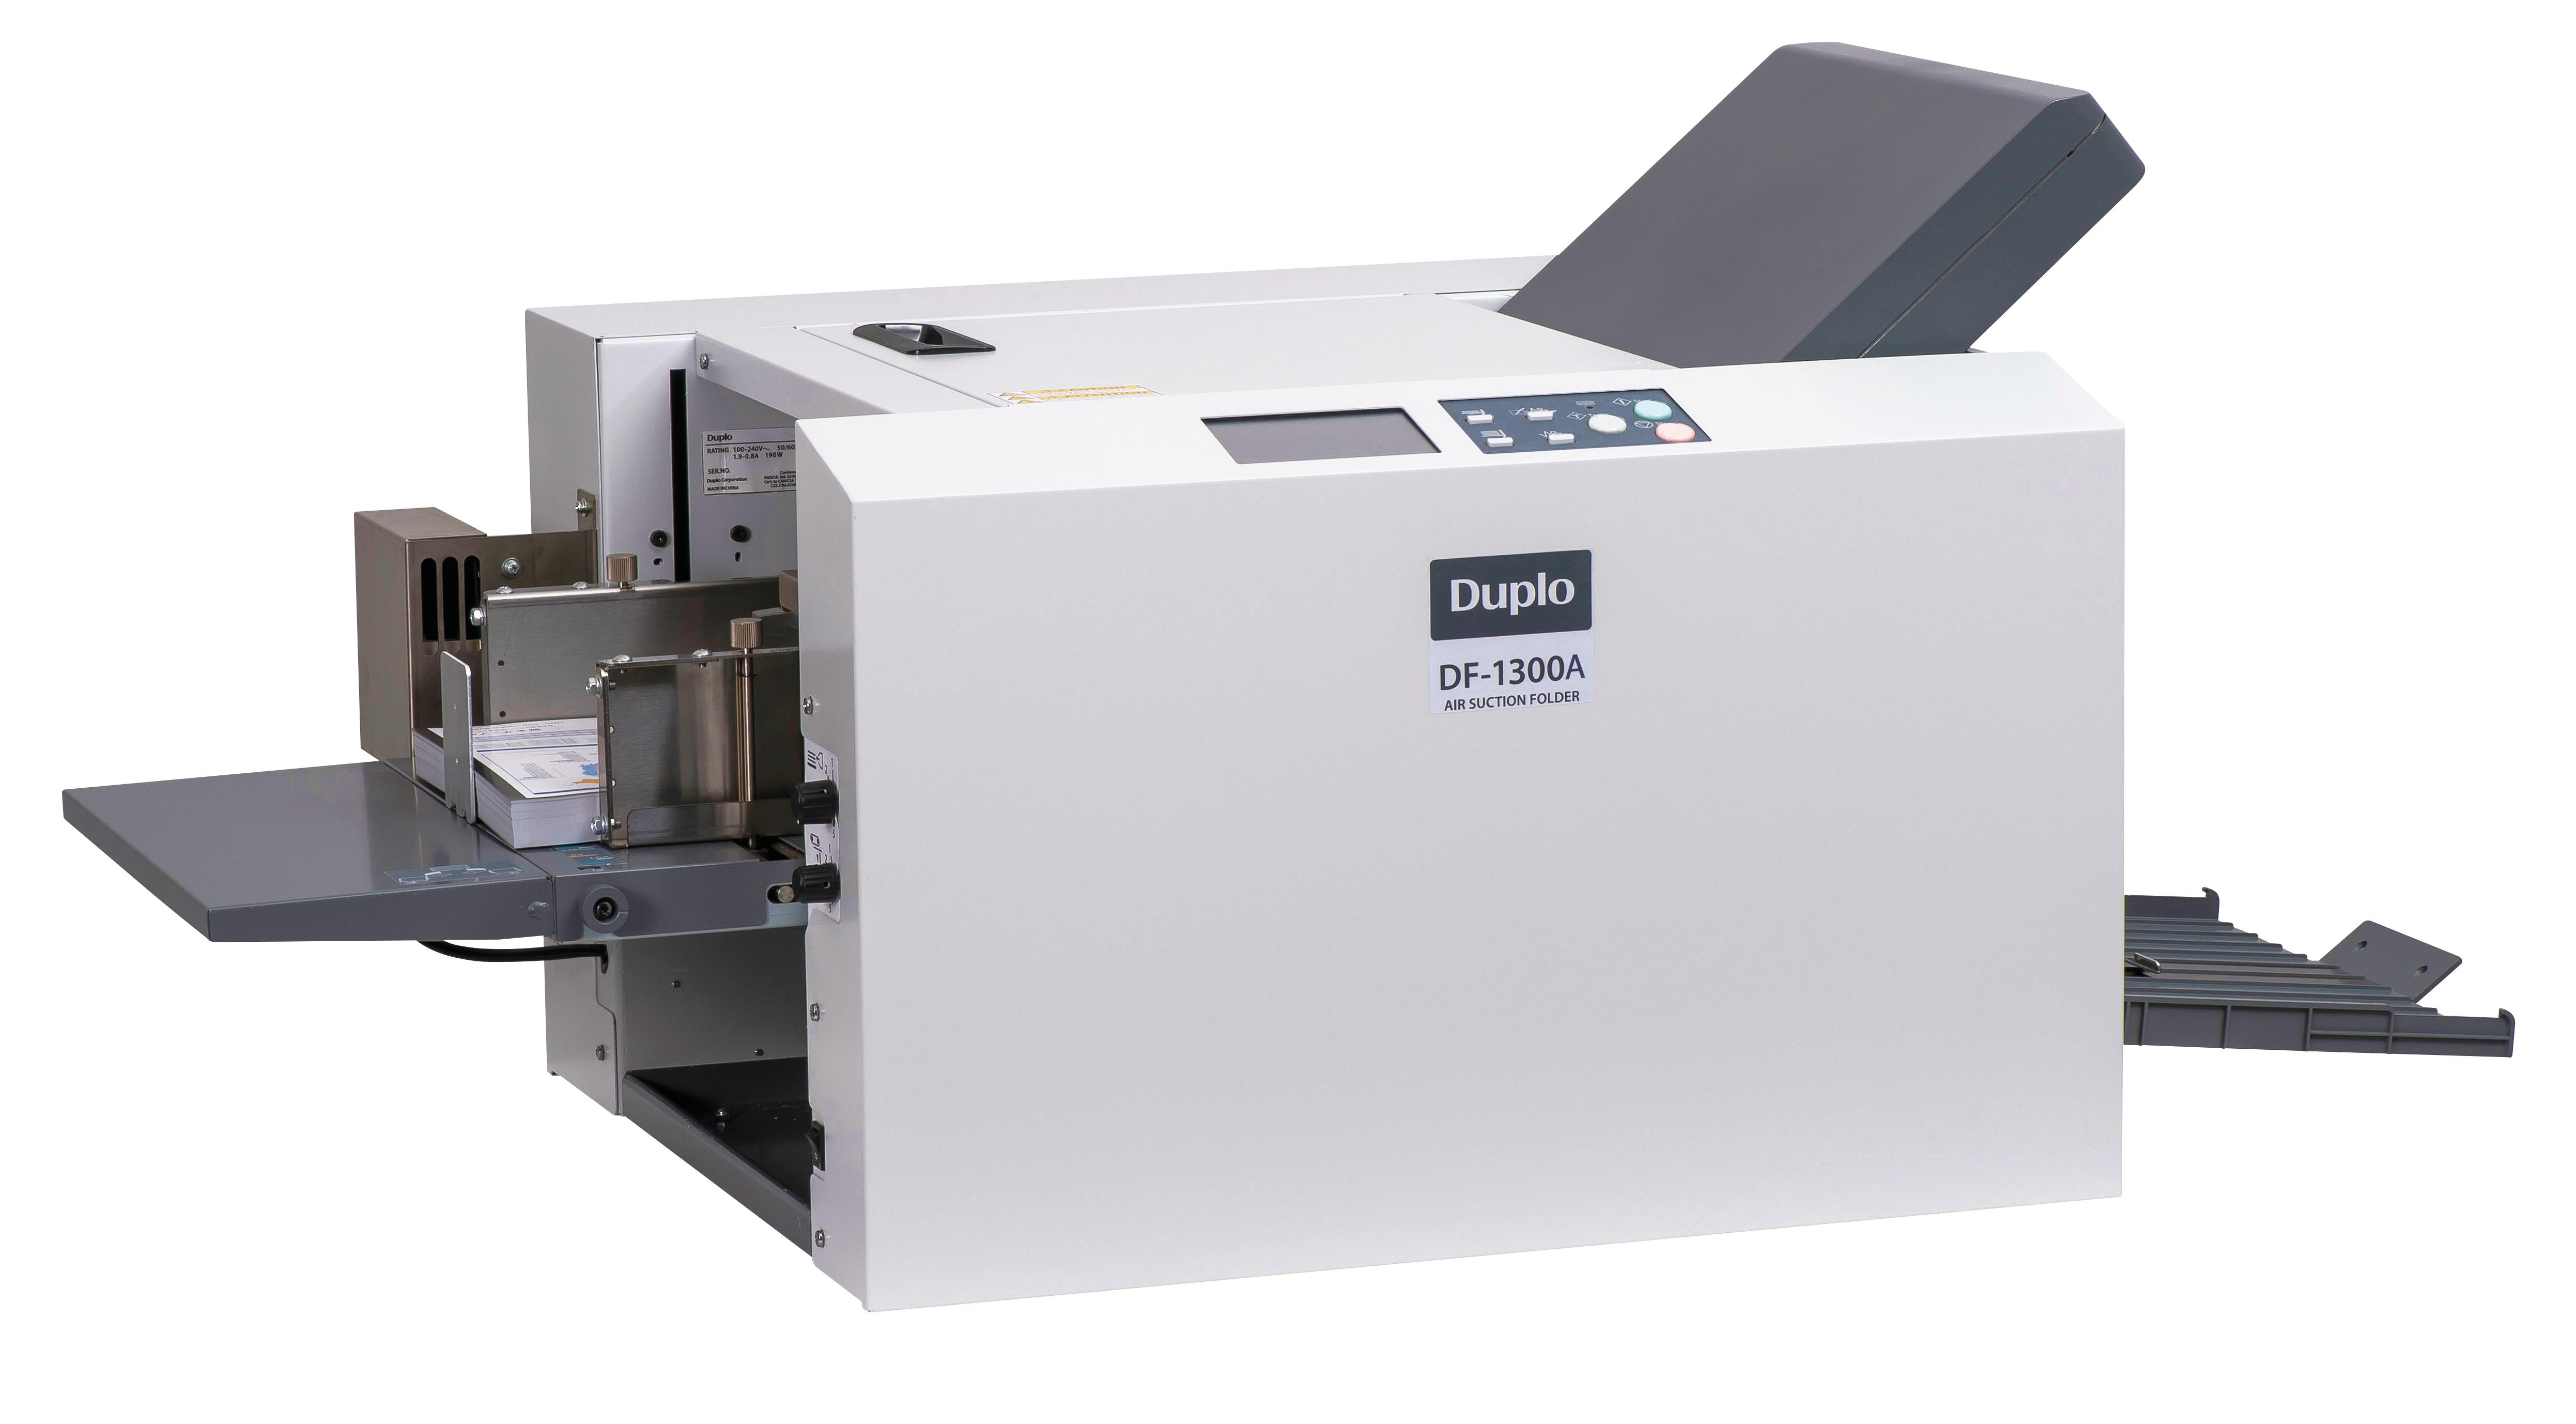 duplo-df-1300a-paper-folder.jpg